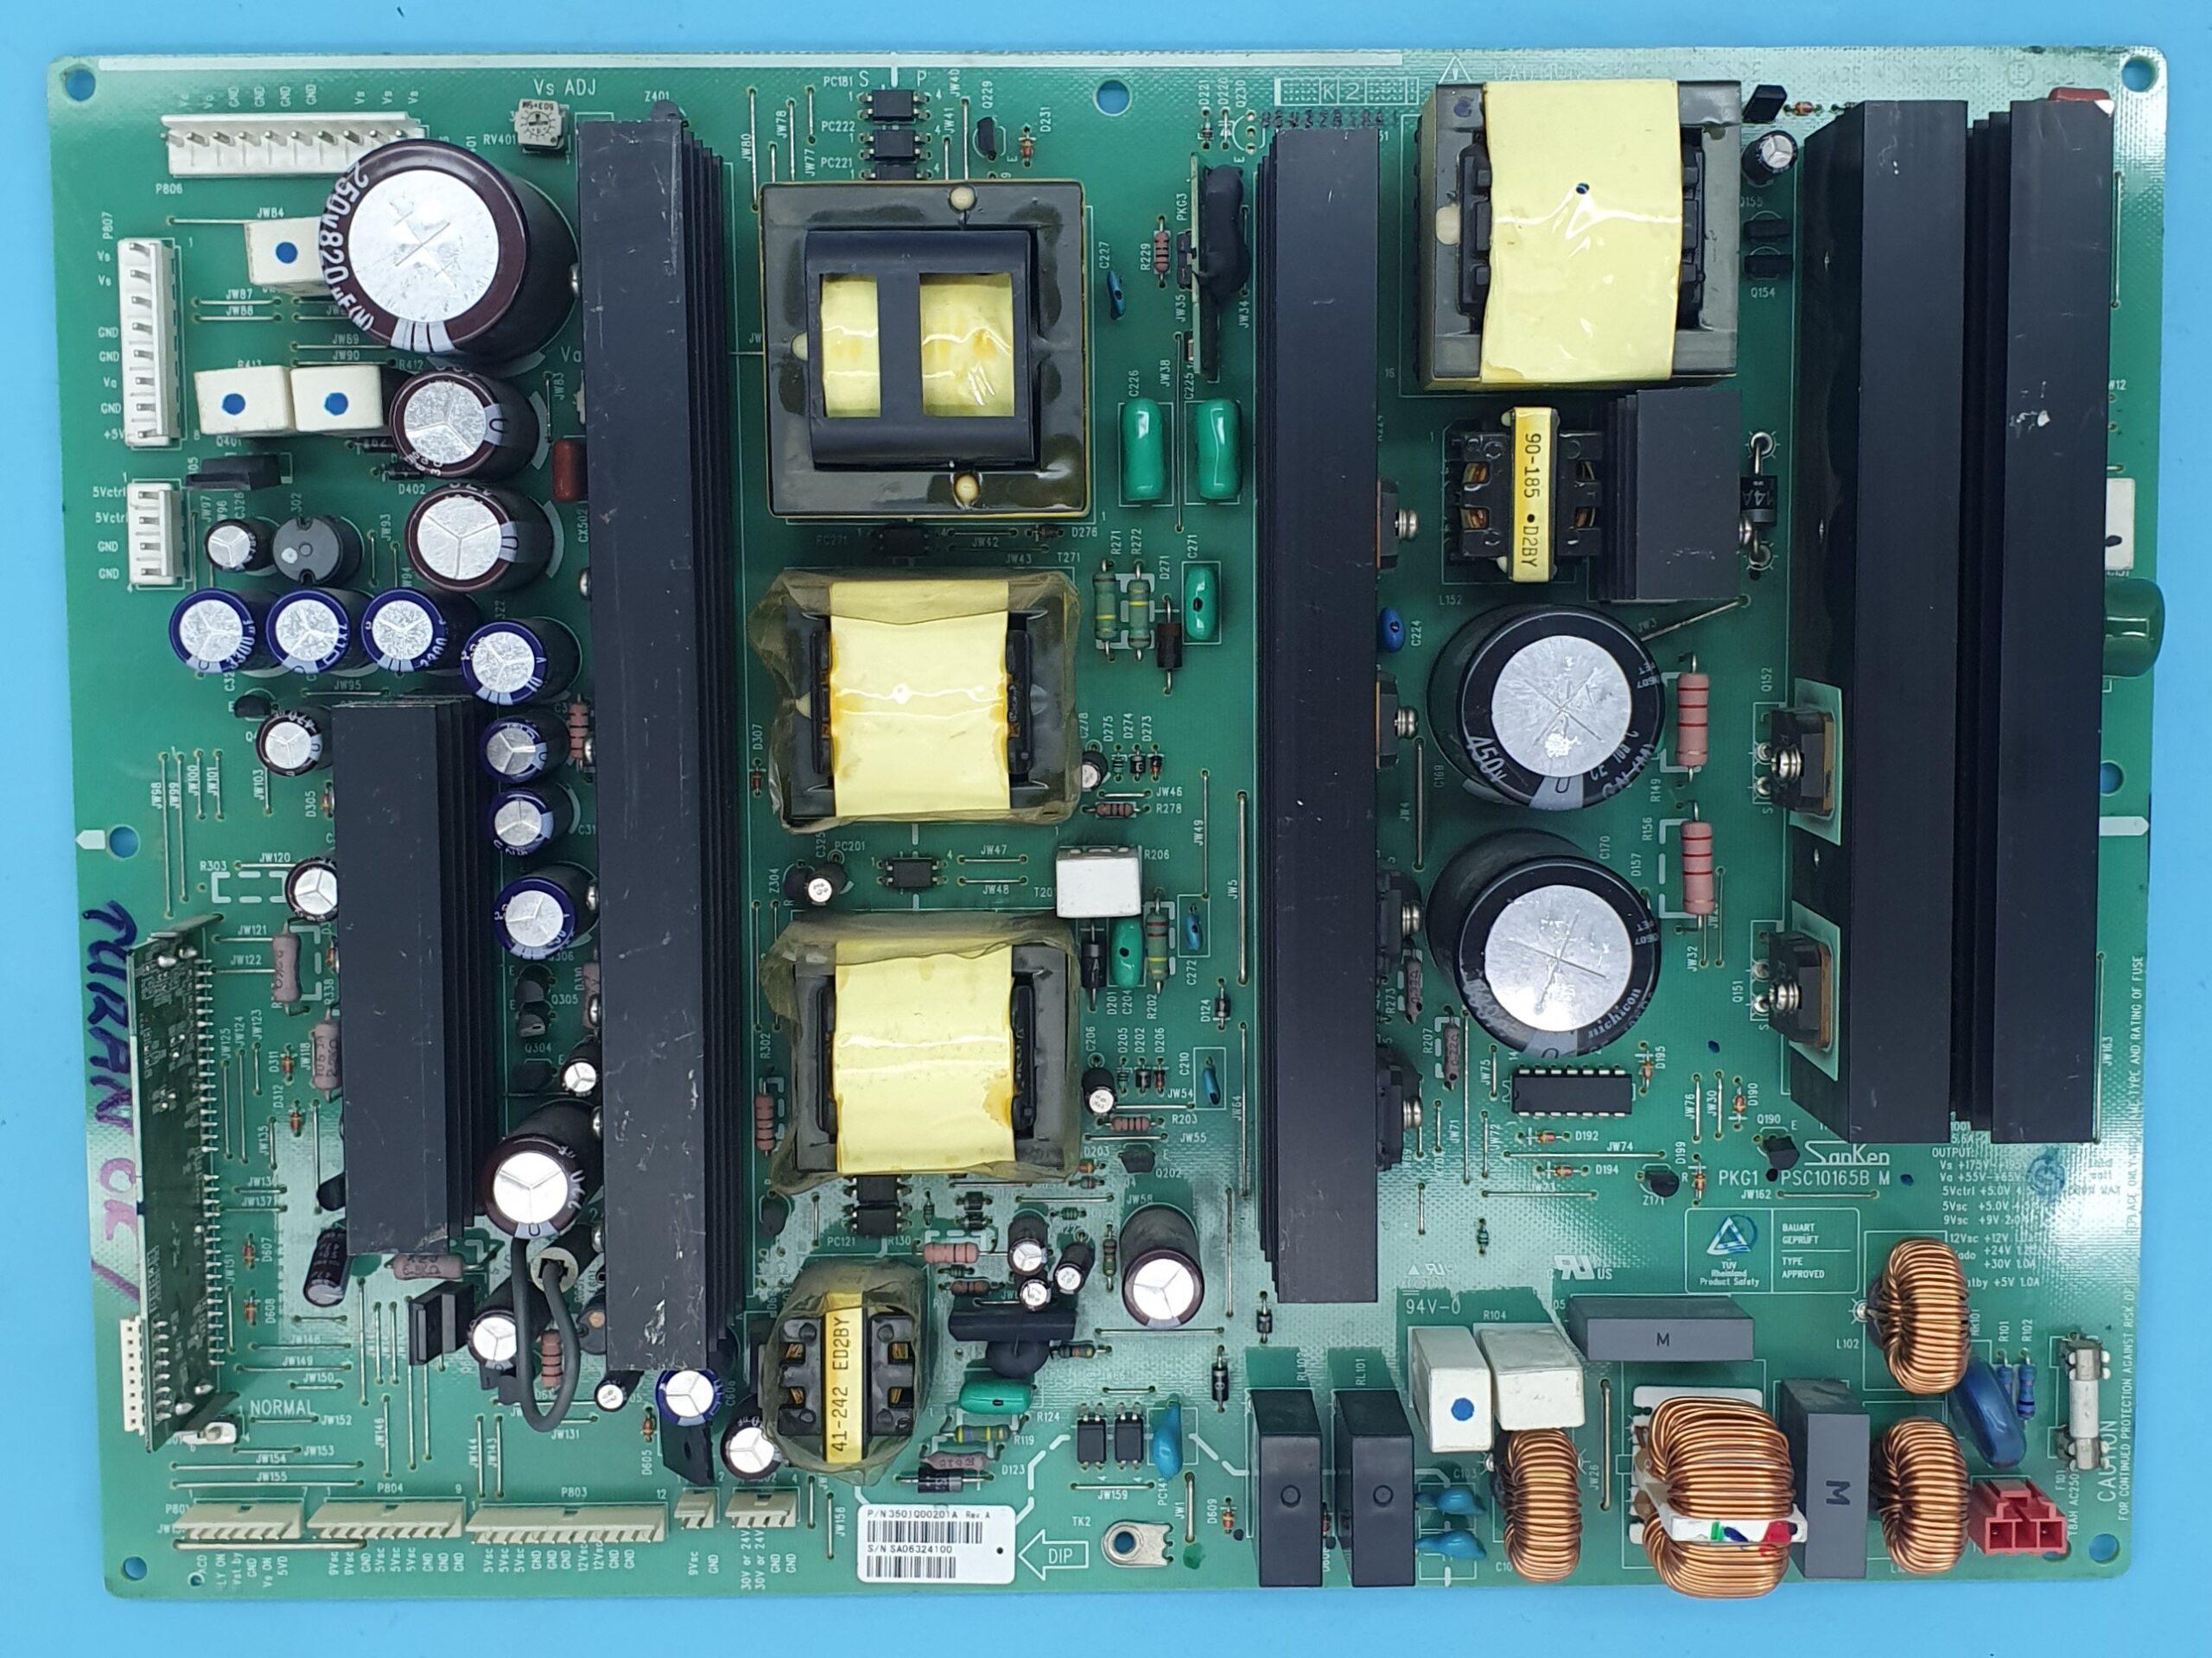 PSC10165B-M Vestel Power (KDV DAHİL = 130 TL)